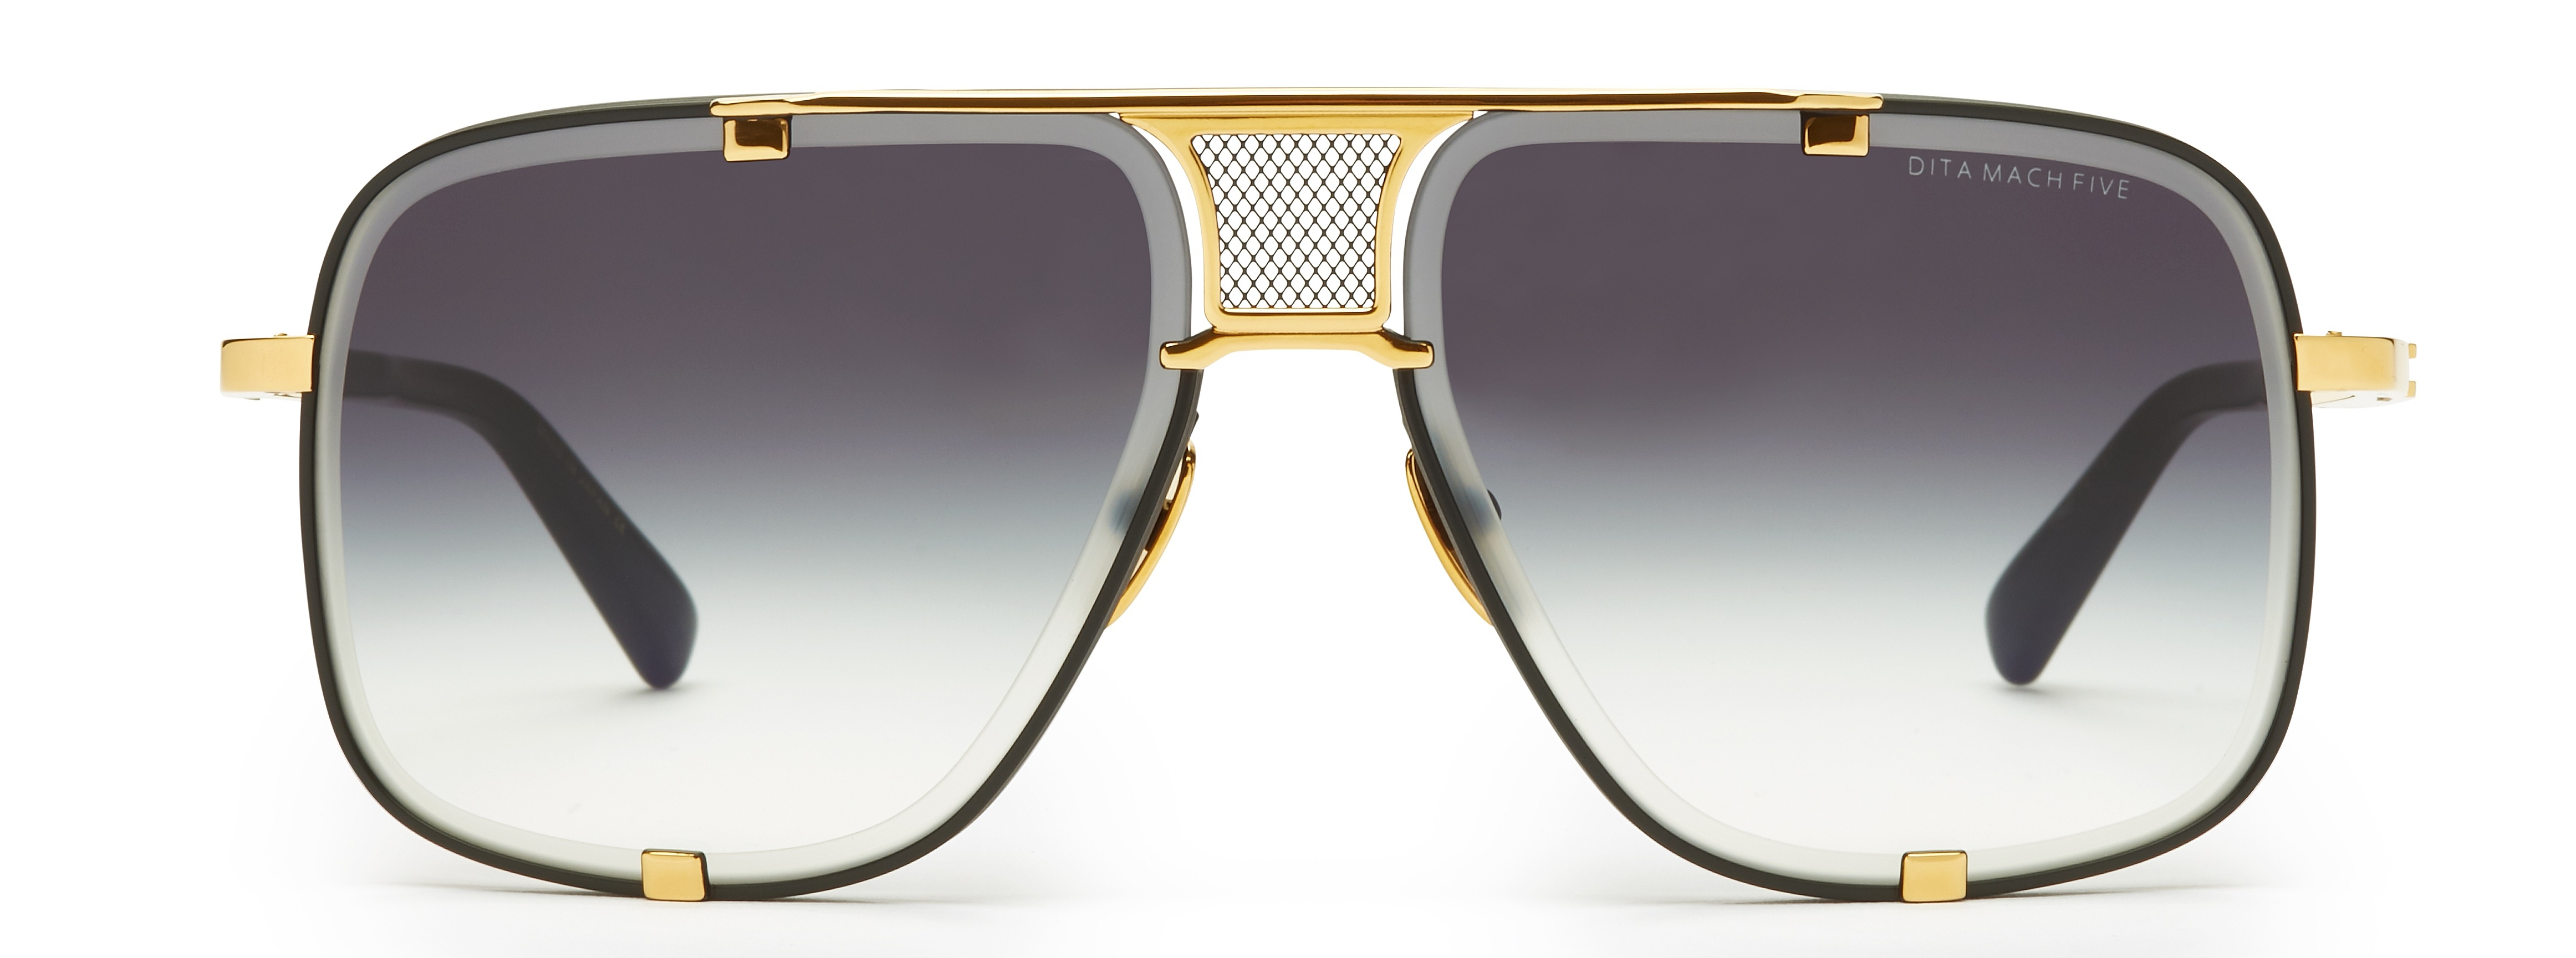 sajt Felelős személy Bók dita mach five sunglasses replica -  szafamadziary.com